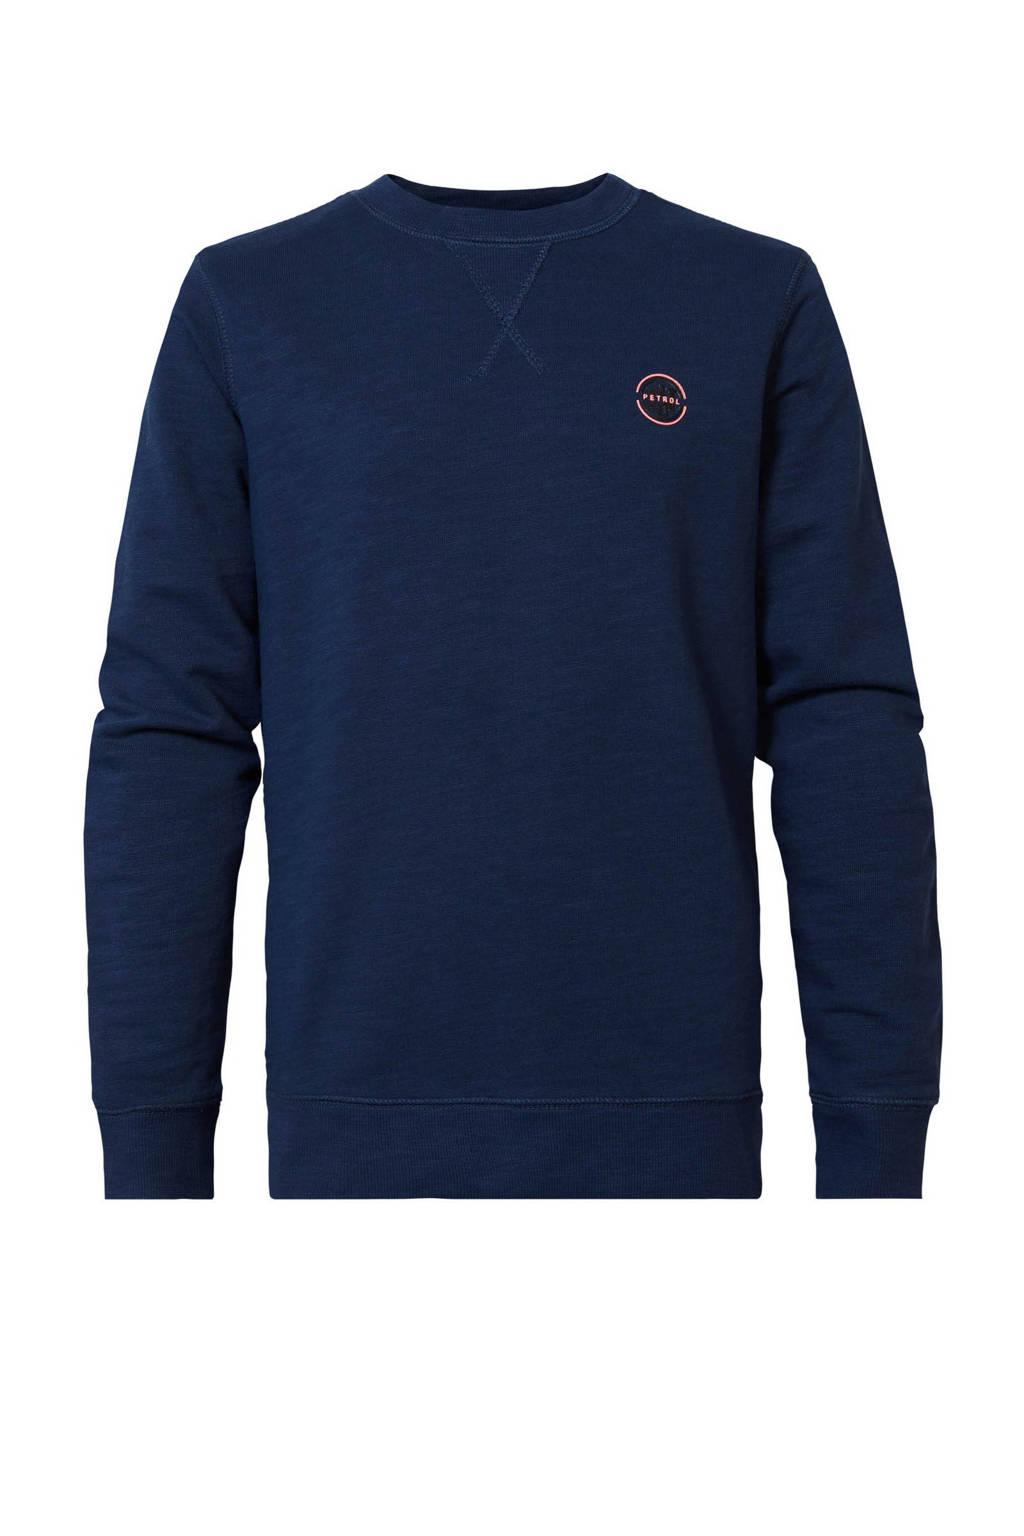 Petrol Industries sweater donkerblauw, Donkerblauw